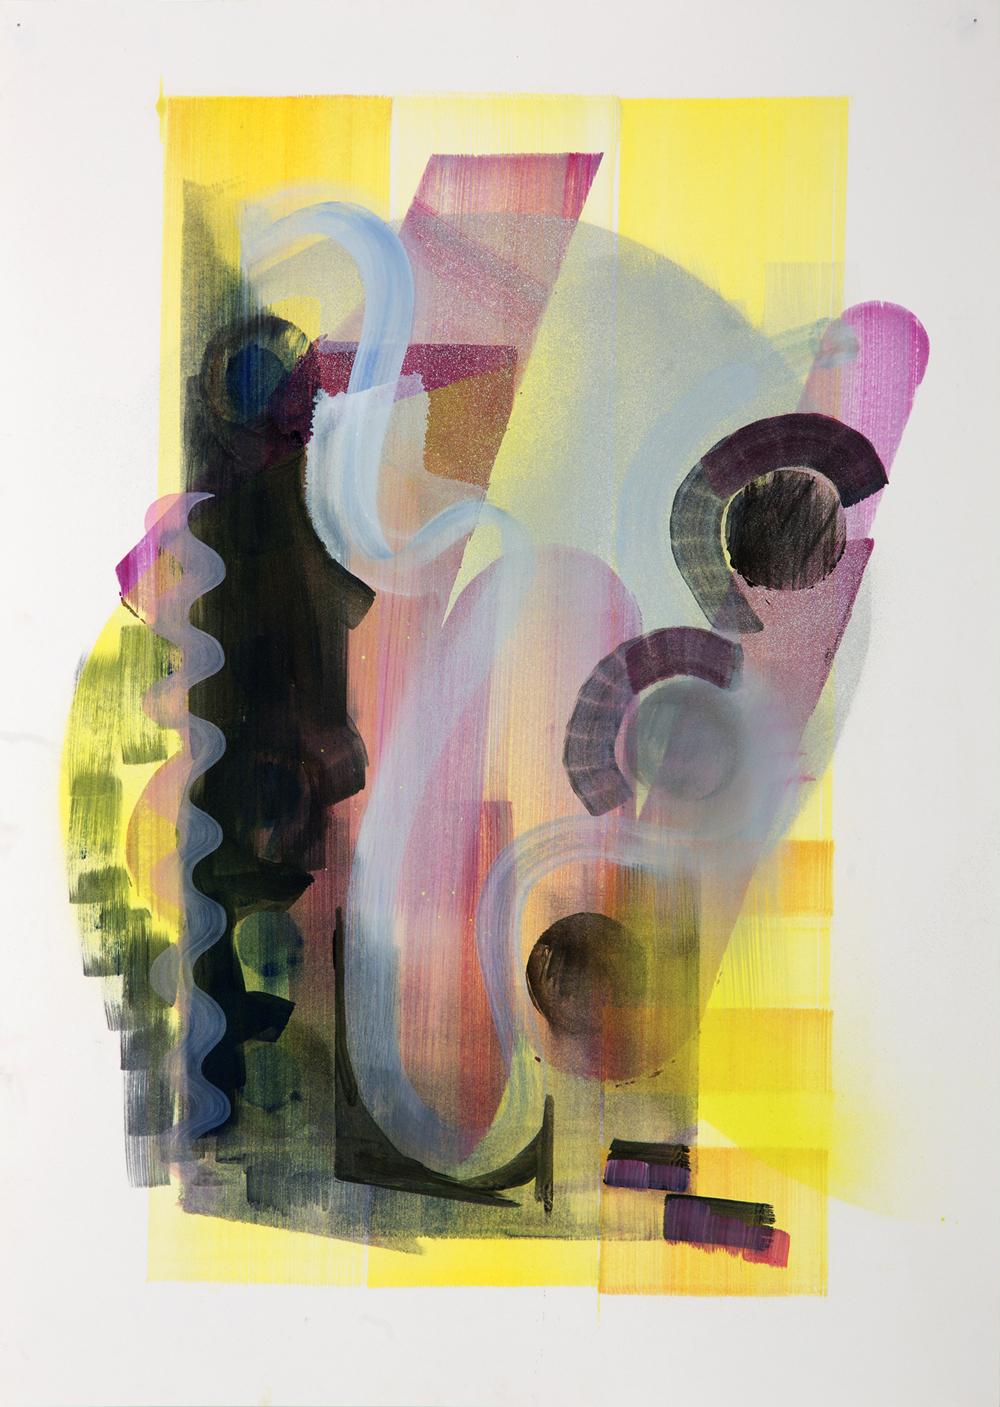 Undergrowth, 2015, oil on paper, 59cm x 42cm